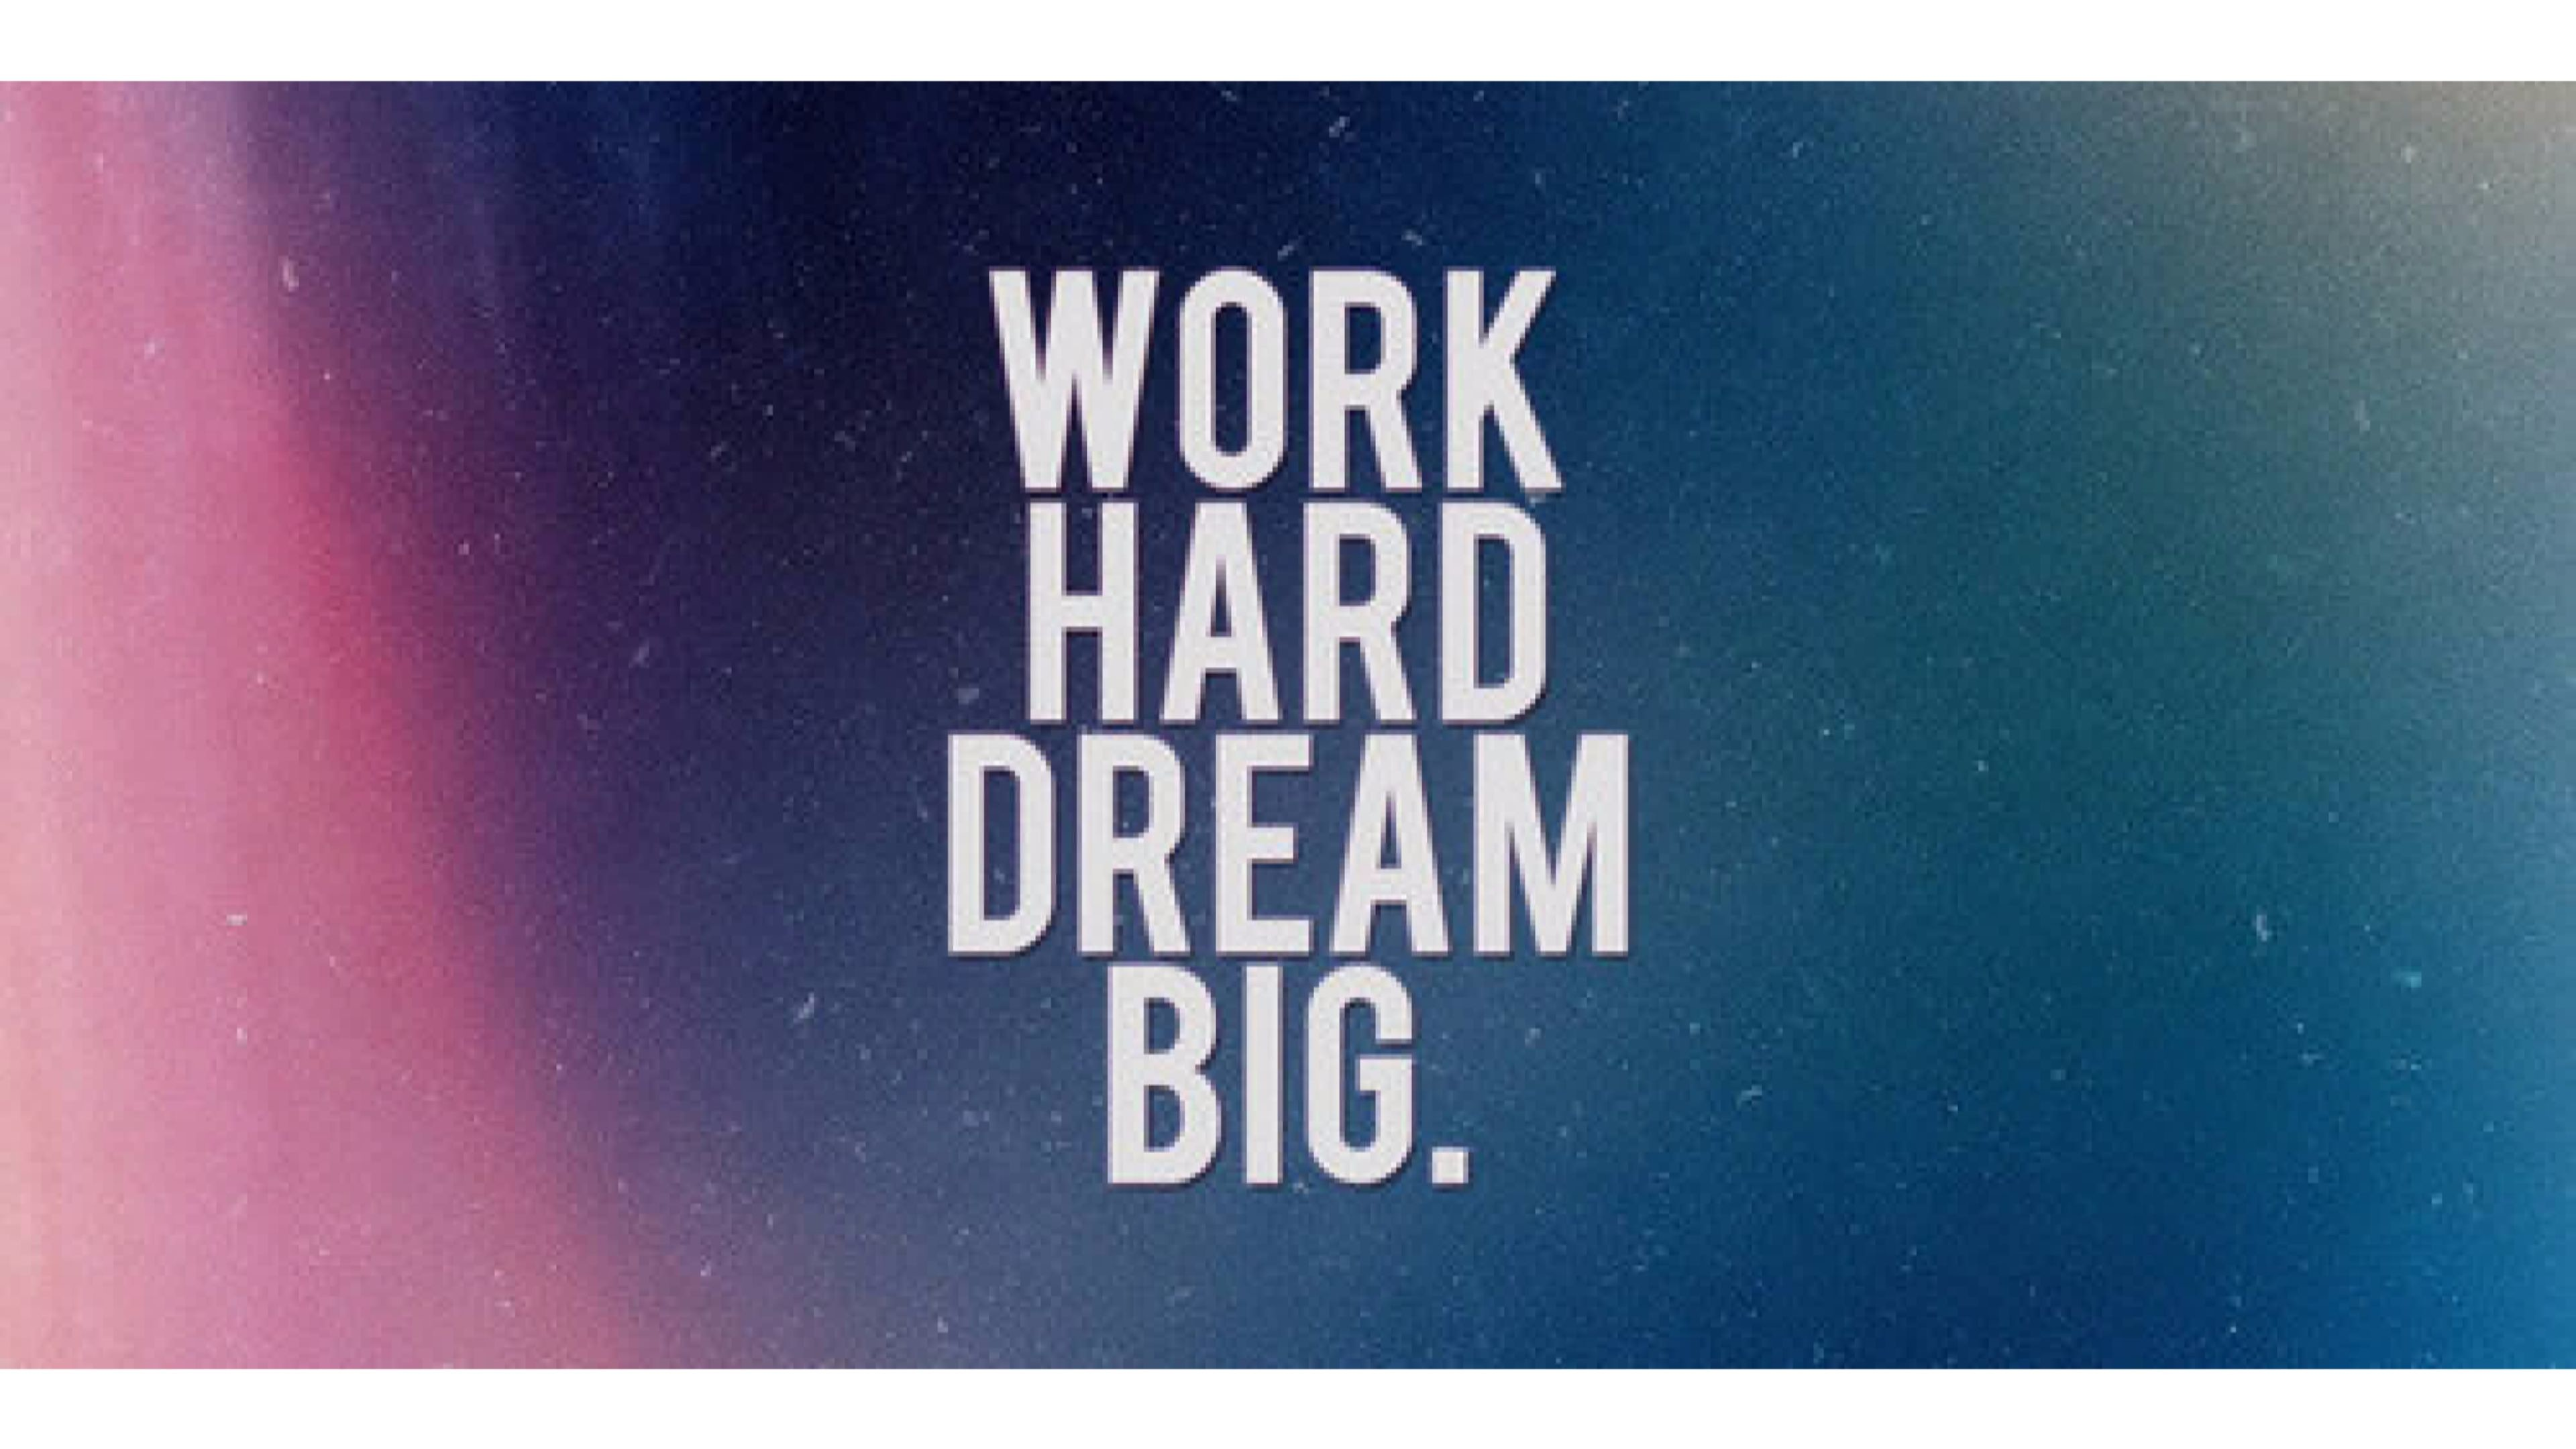 Study Motivation Wallpaper (70+ Images